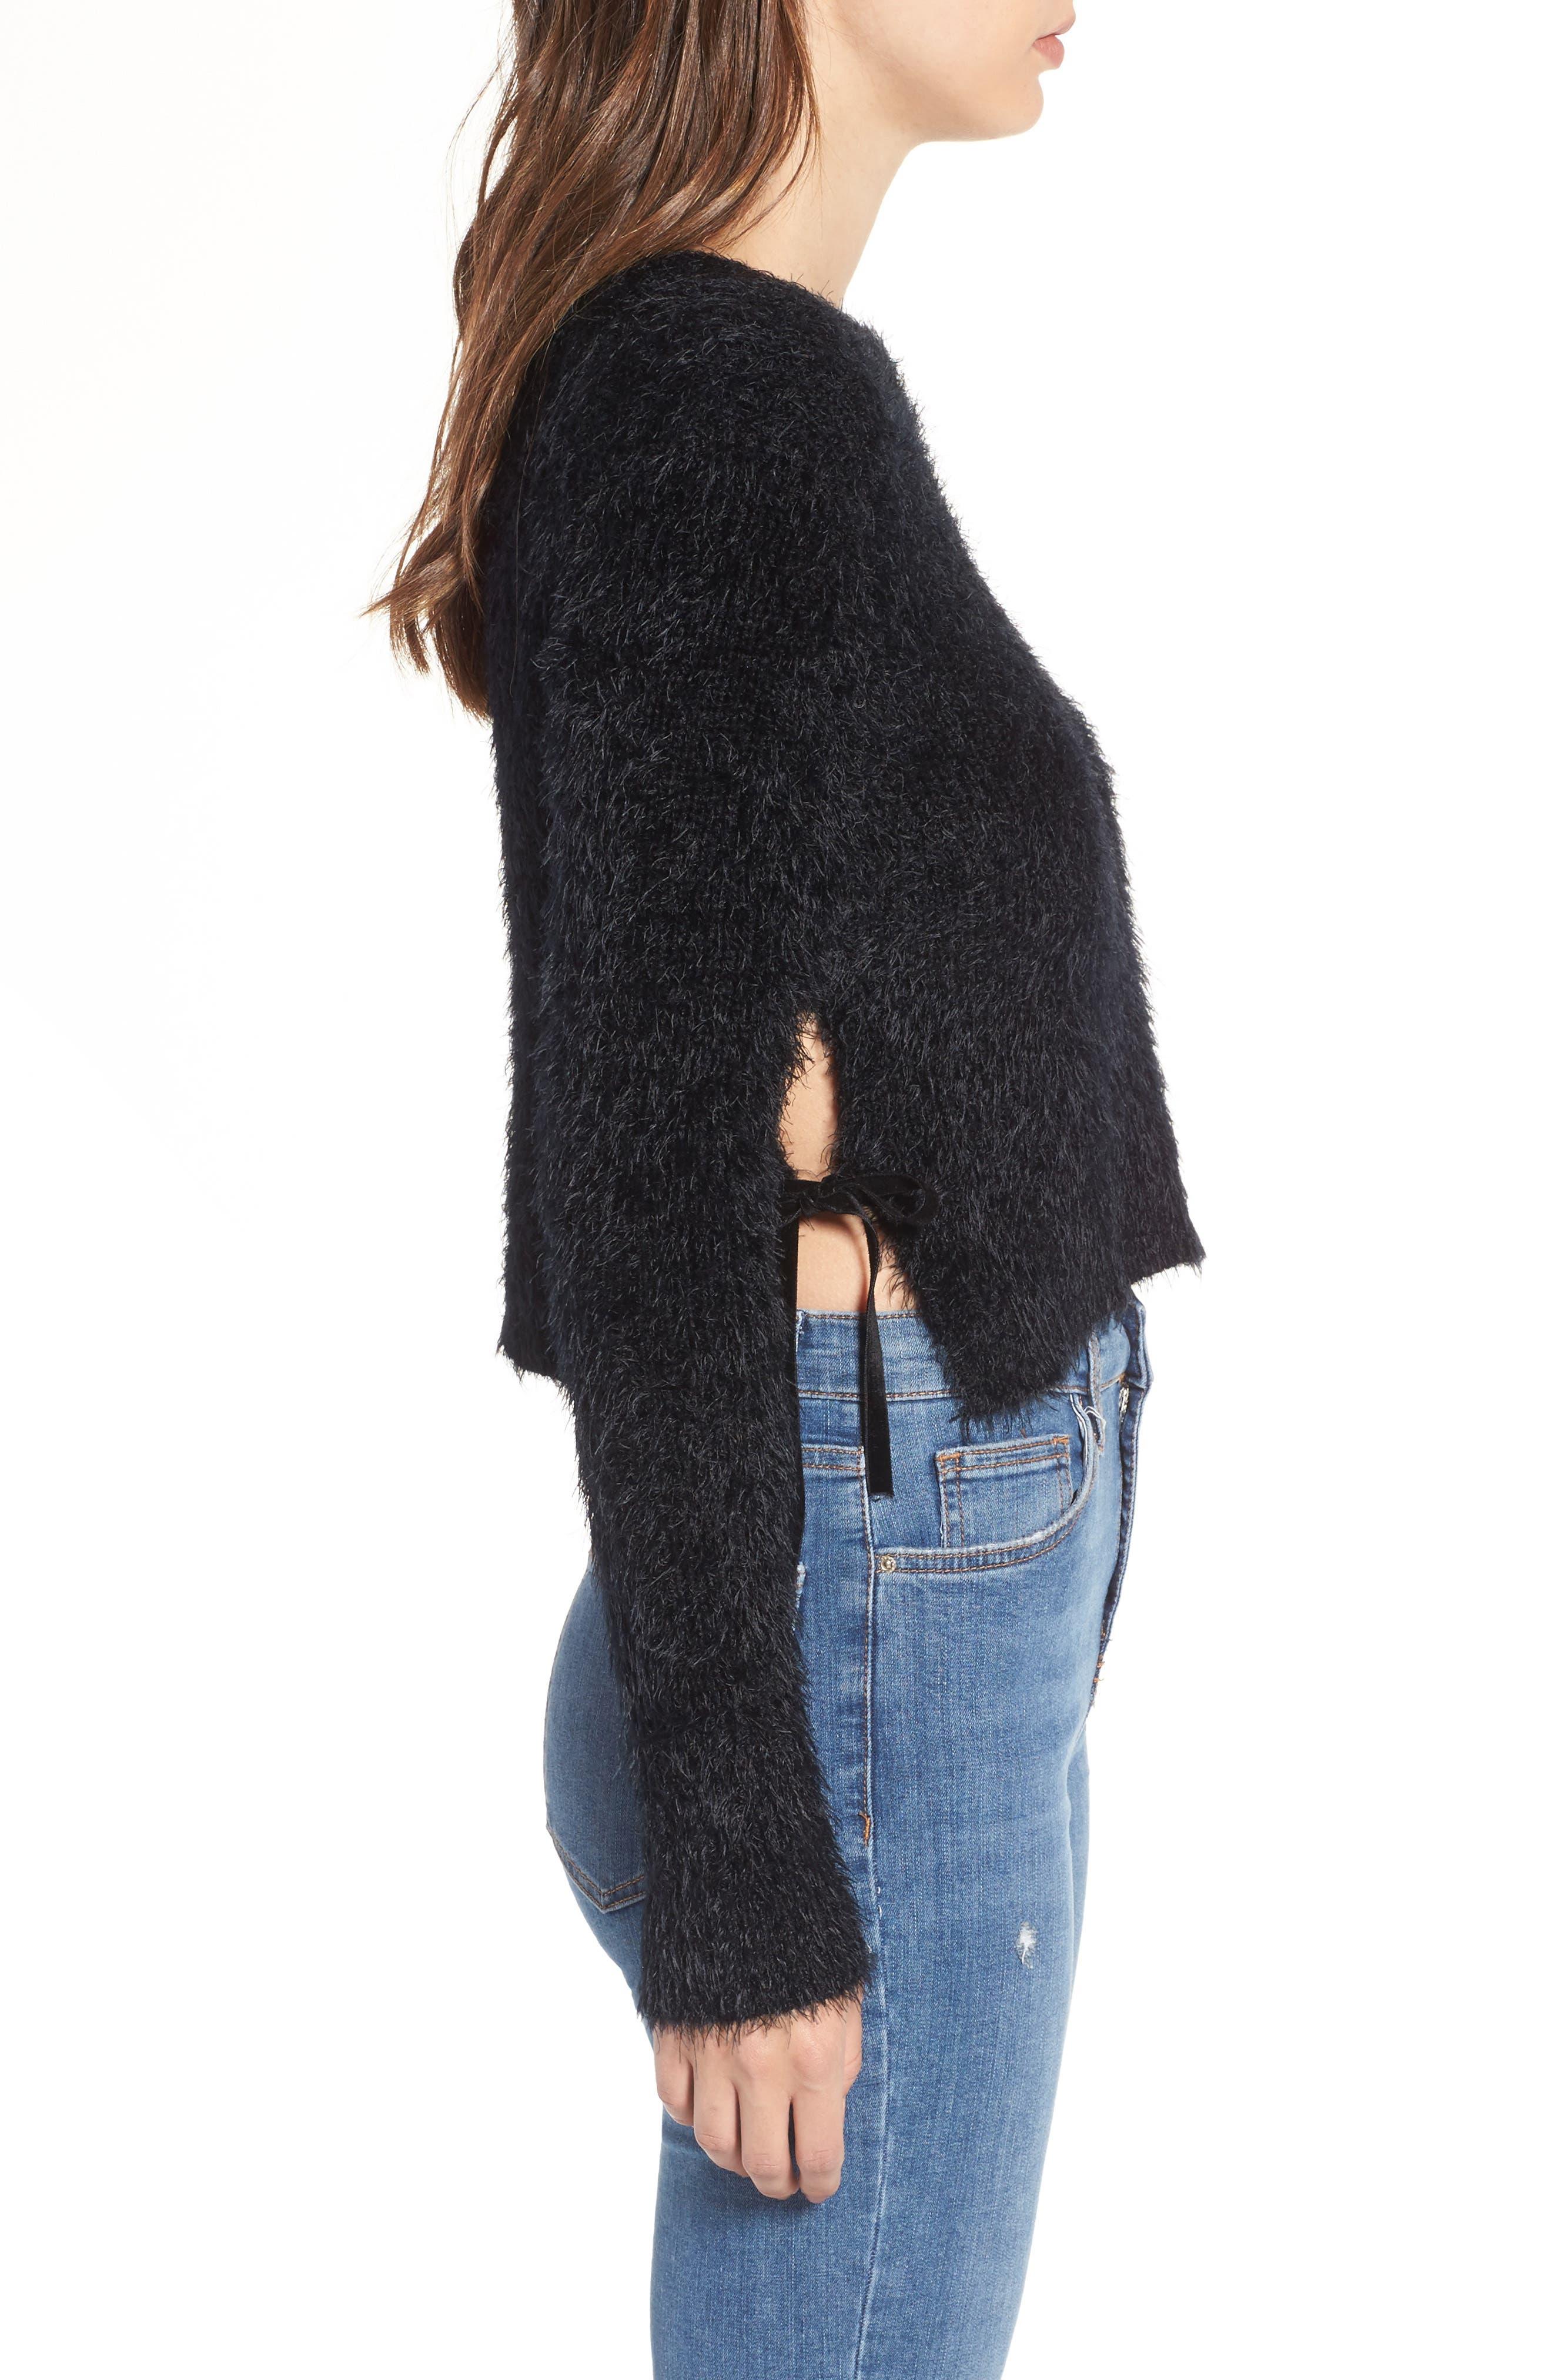 MAJORELLE,                             Majesty Tie Crop Sweater,                             Alternate thumbnail 3, color,                             001